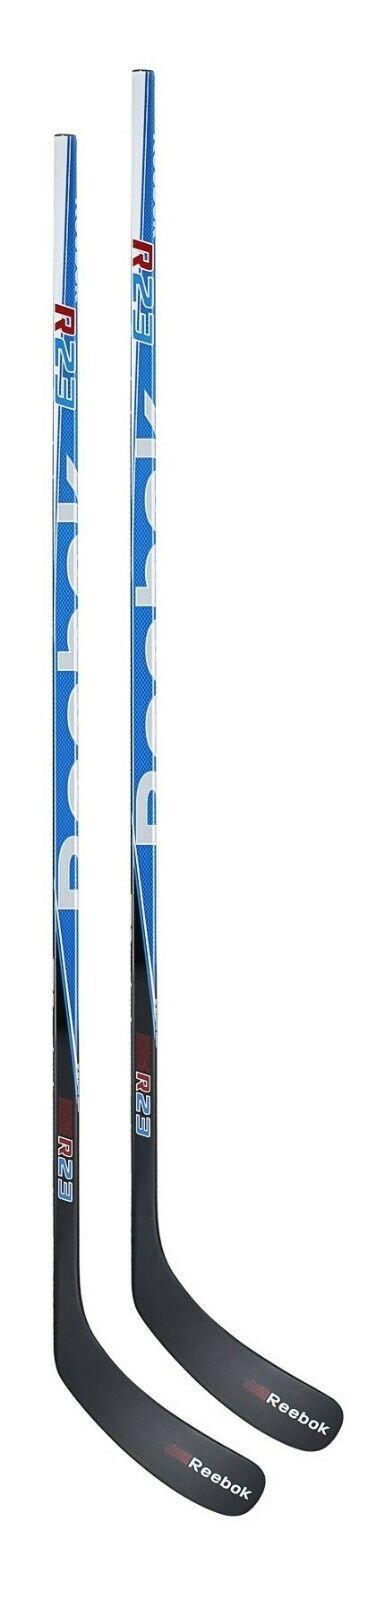 2 New Reebok R23 Grip Sr hockey stick 85 flex P29 left hand LH senior composite